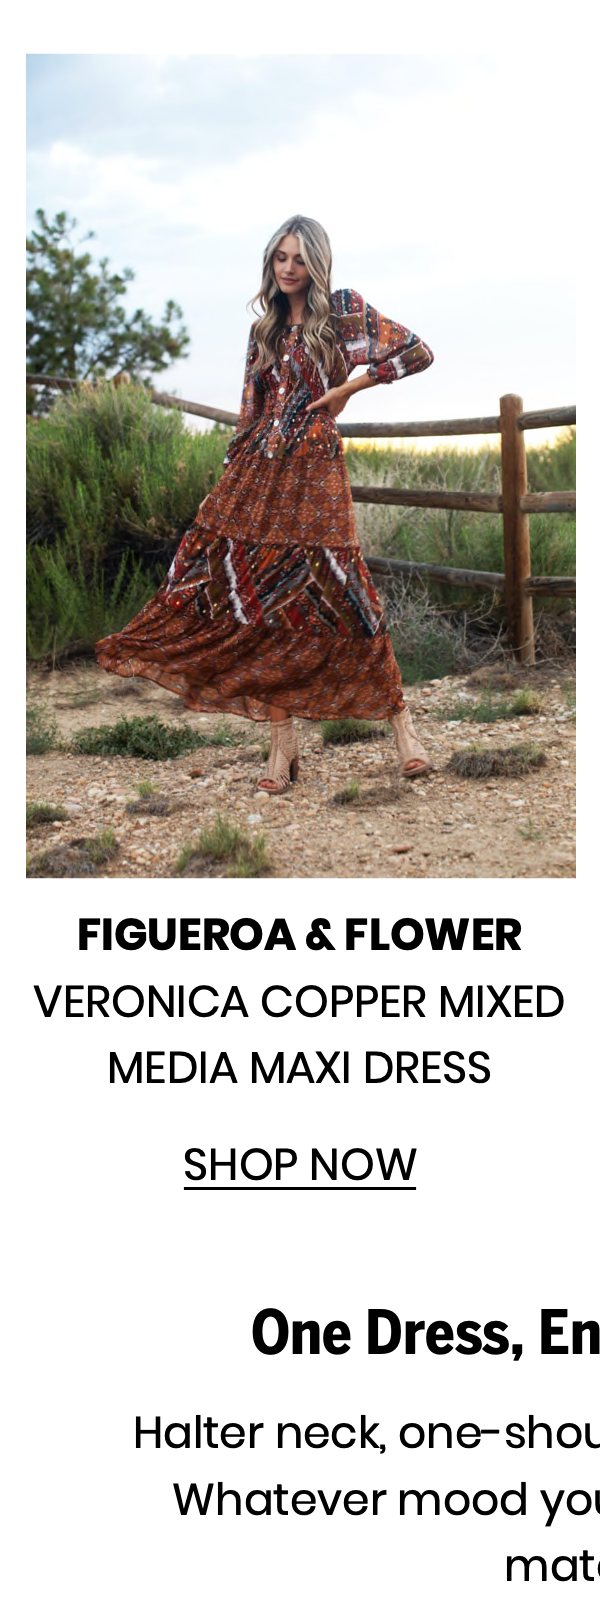 "Shop the ""Veronica Copper Mixed Media Maxi Dress"" by Figueroa & Flower"